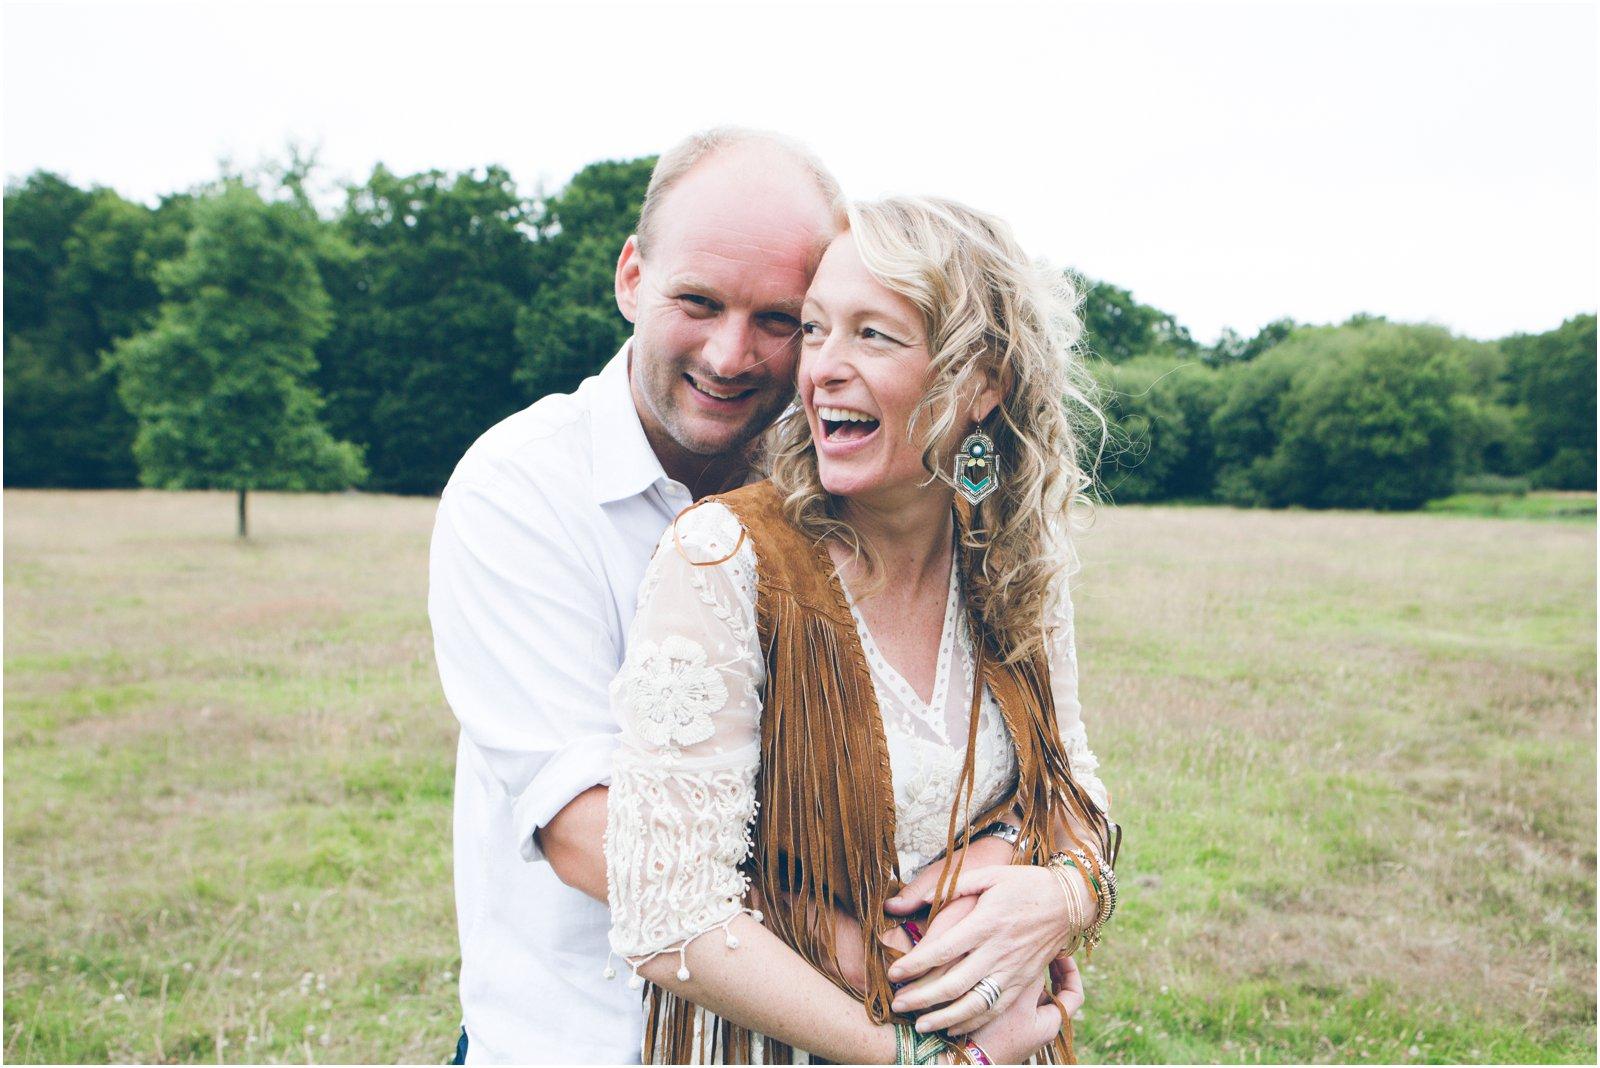 Sally and Damien's wedding festival by Summertown Pictures-77_DerrynSchmidt